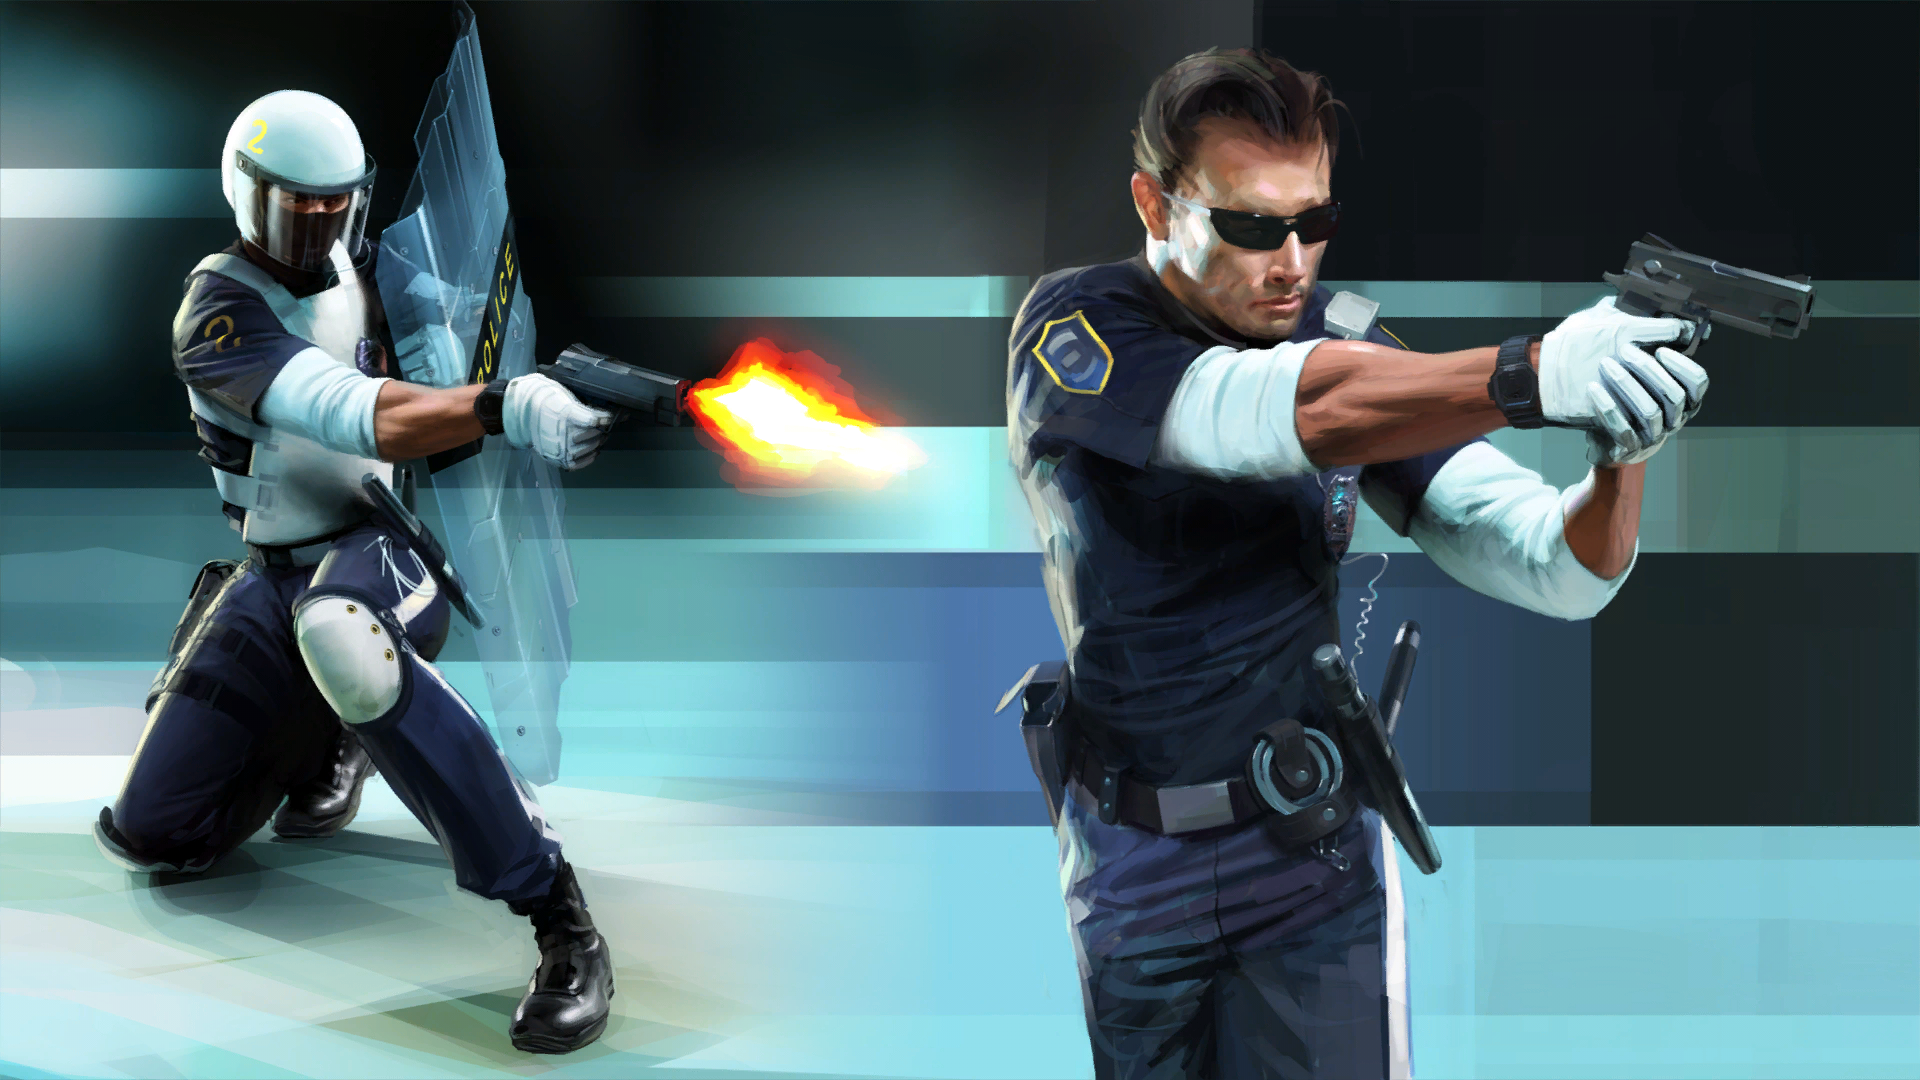 Mirror's  Edge Concept Art (Policeman, sci-fi)